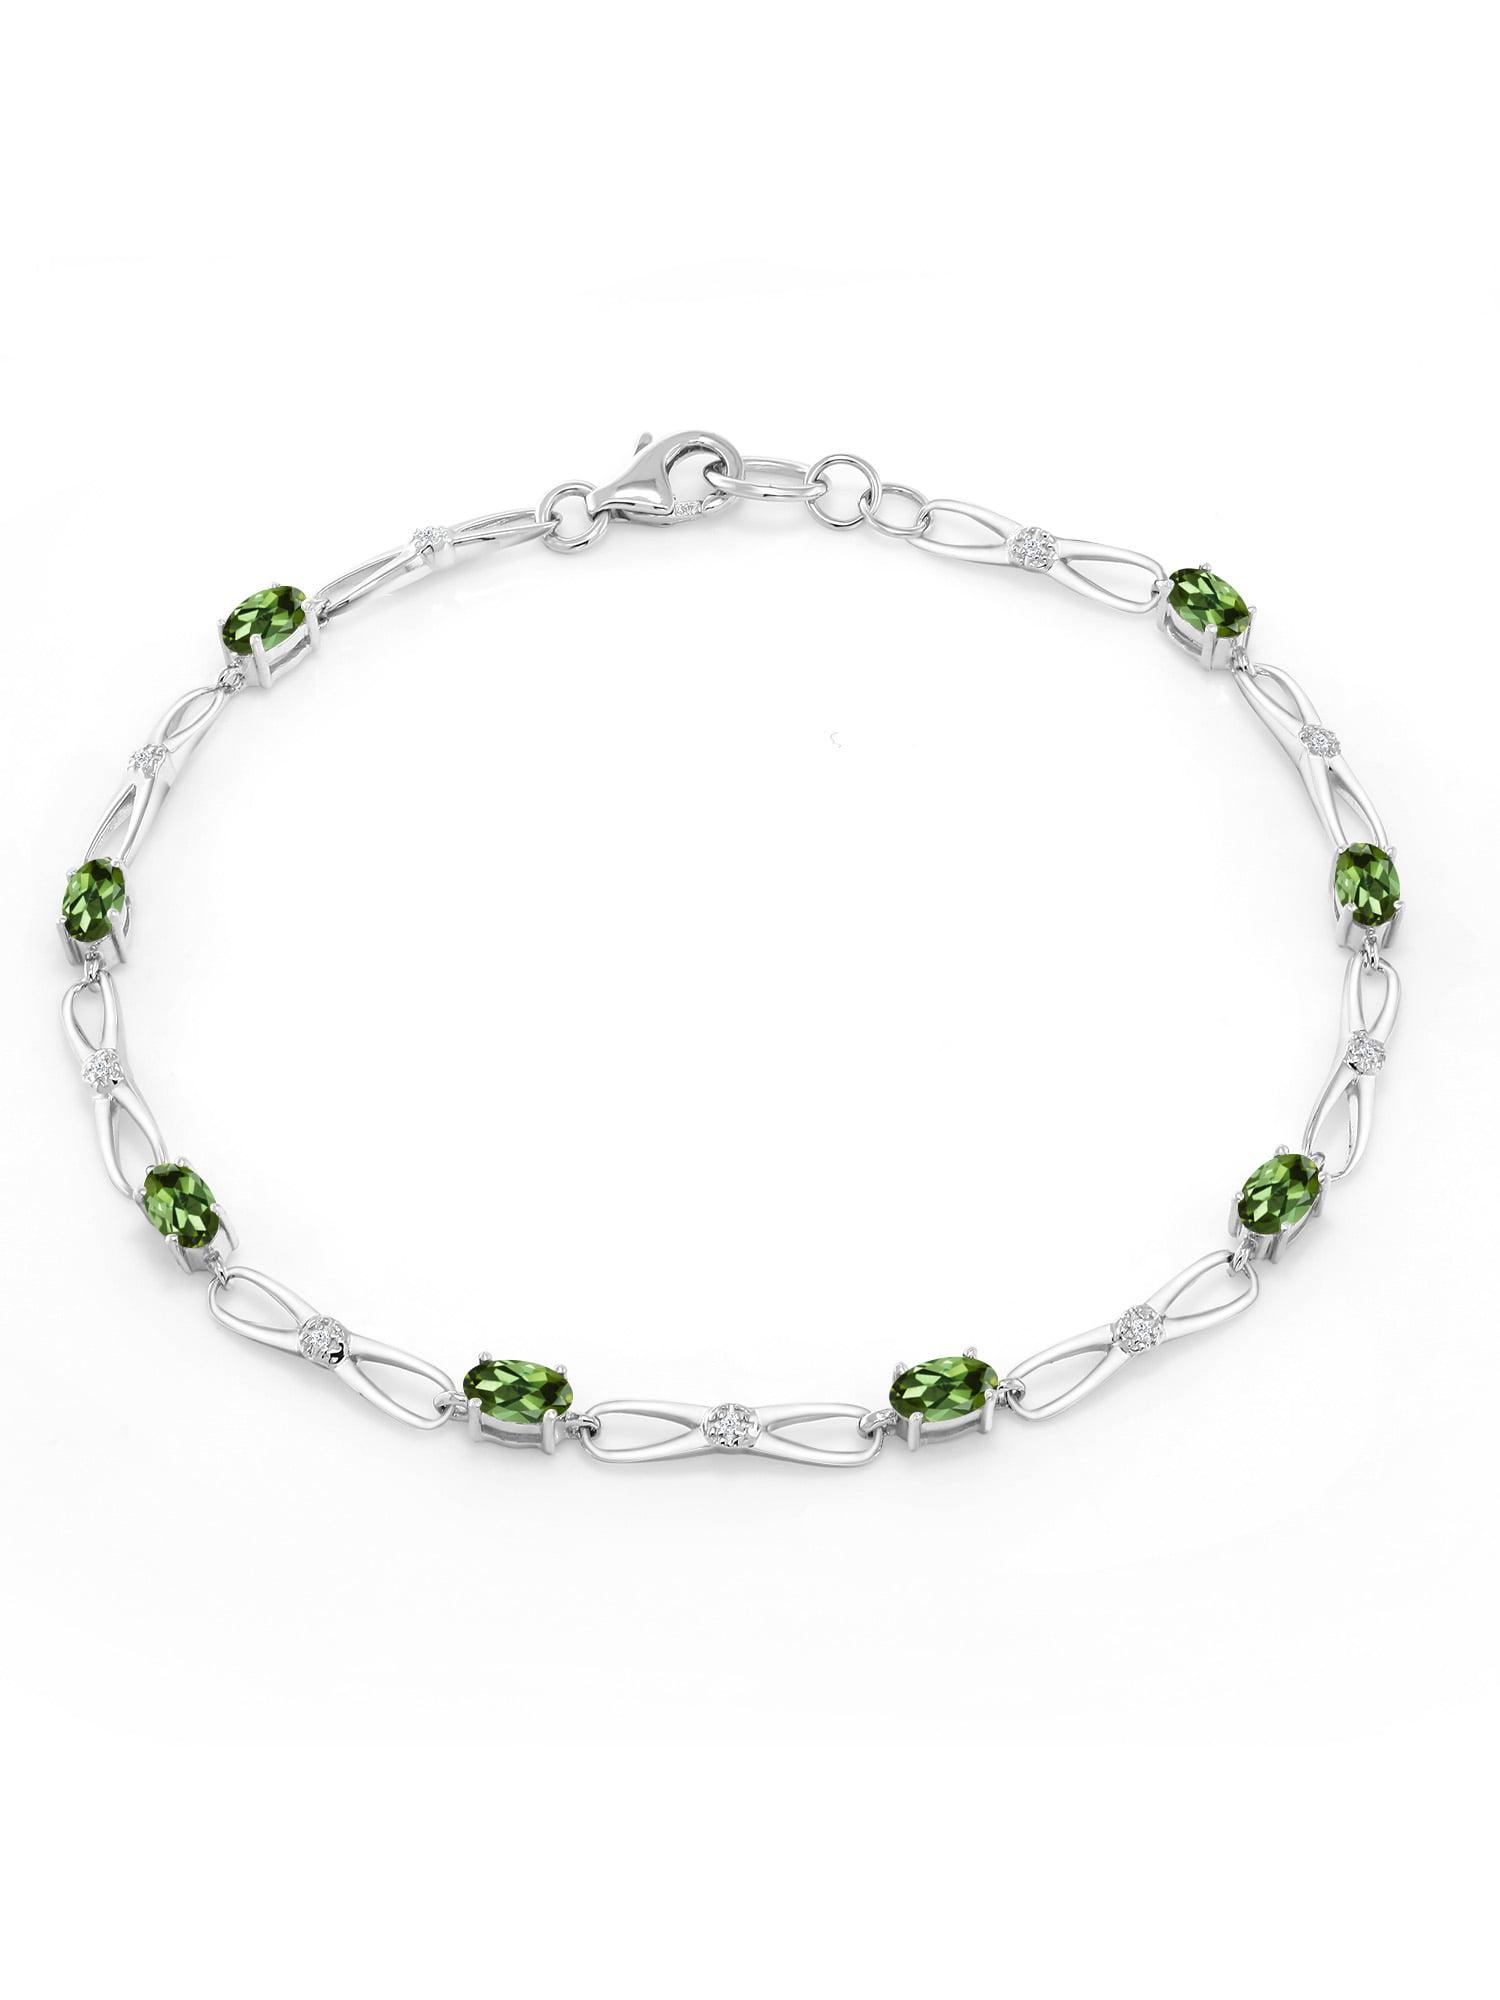 0.06 Ct Oval Green Tourmaline White Diamond 10K White Gold Bracelet by